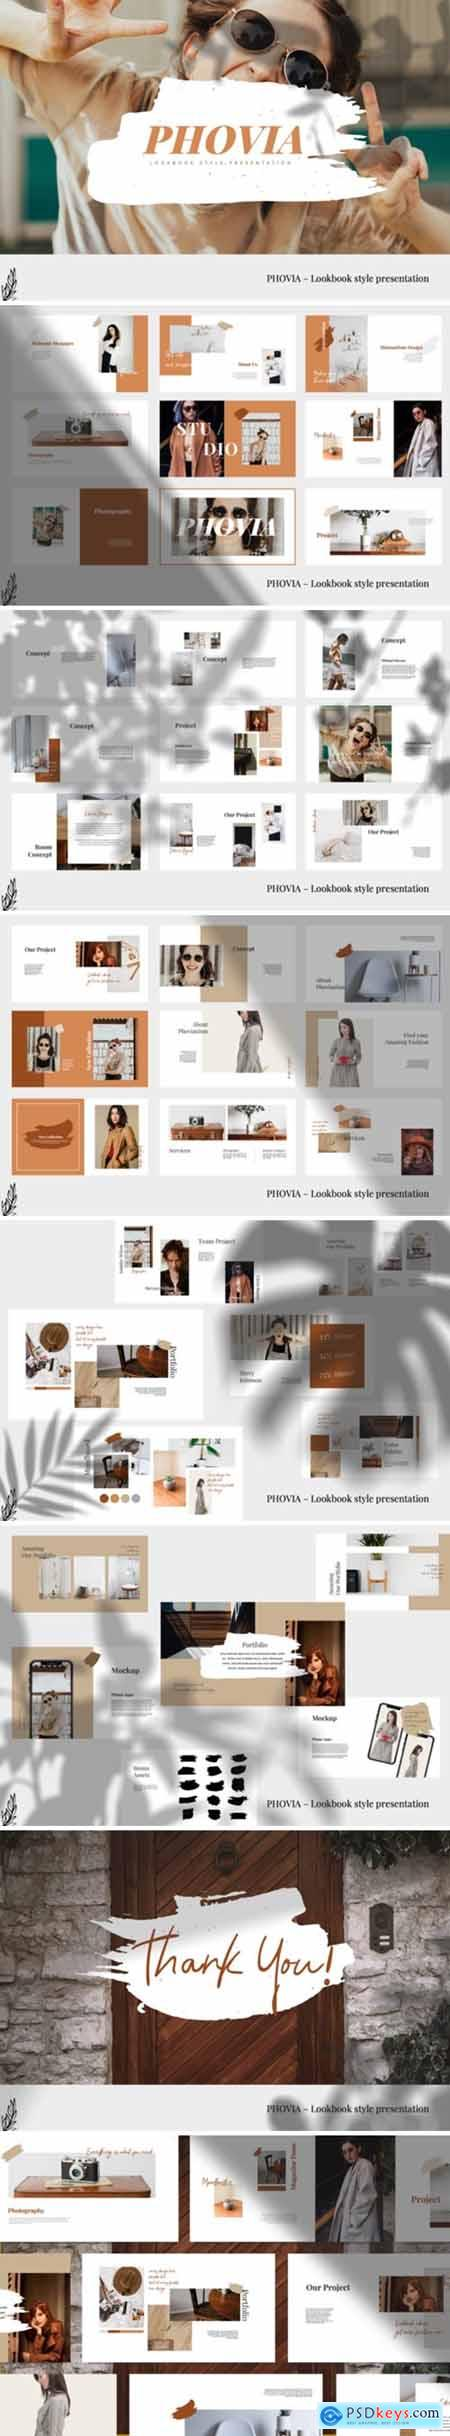 Phovia - Lookbook Style Powerpoint 4264856